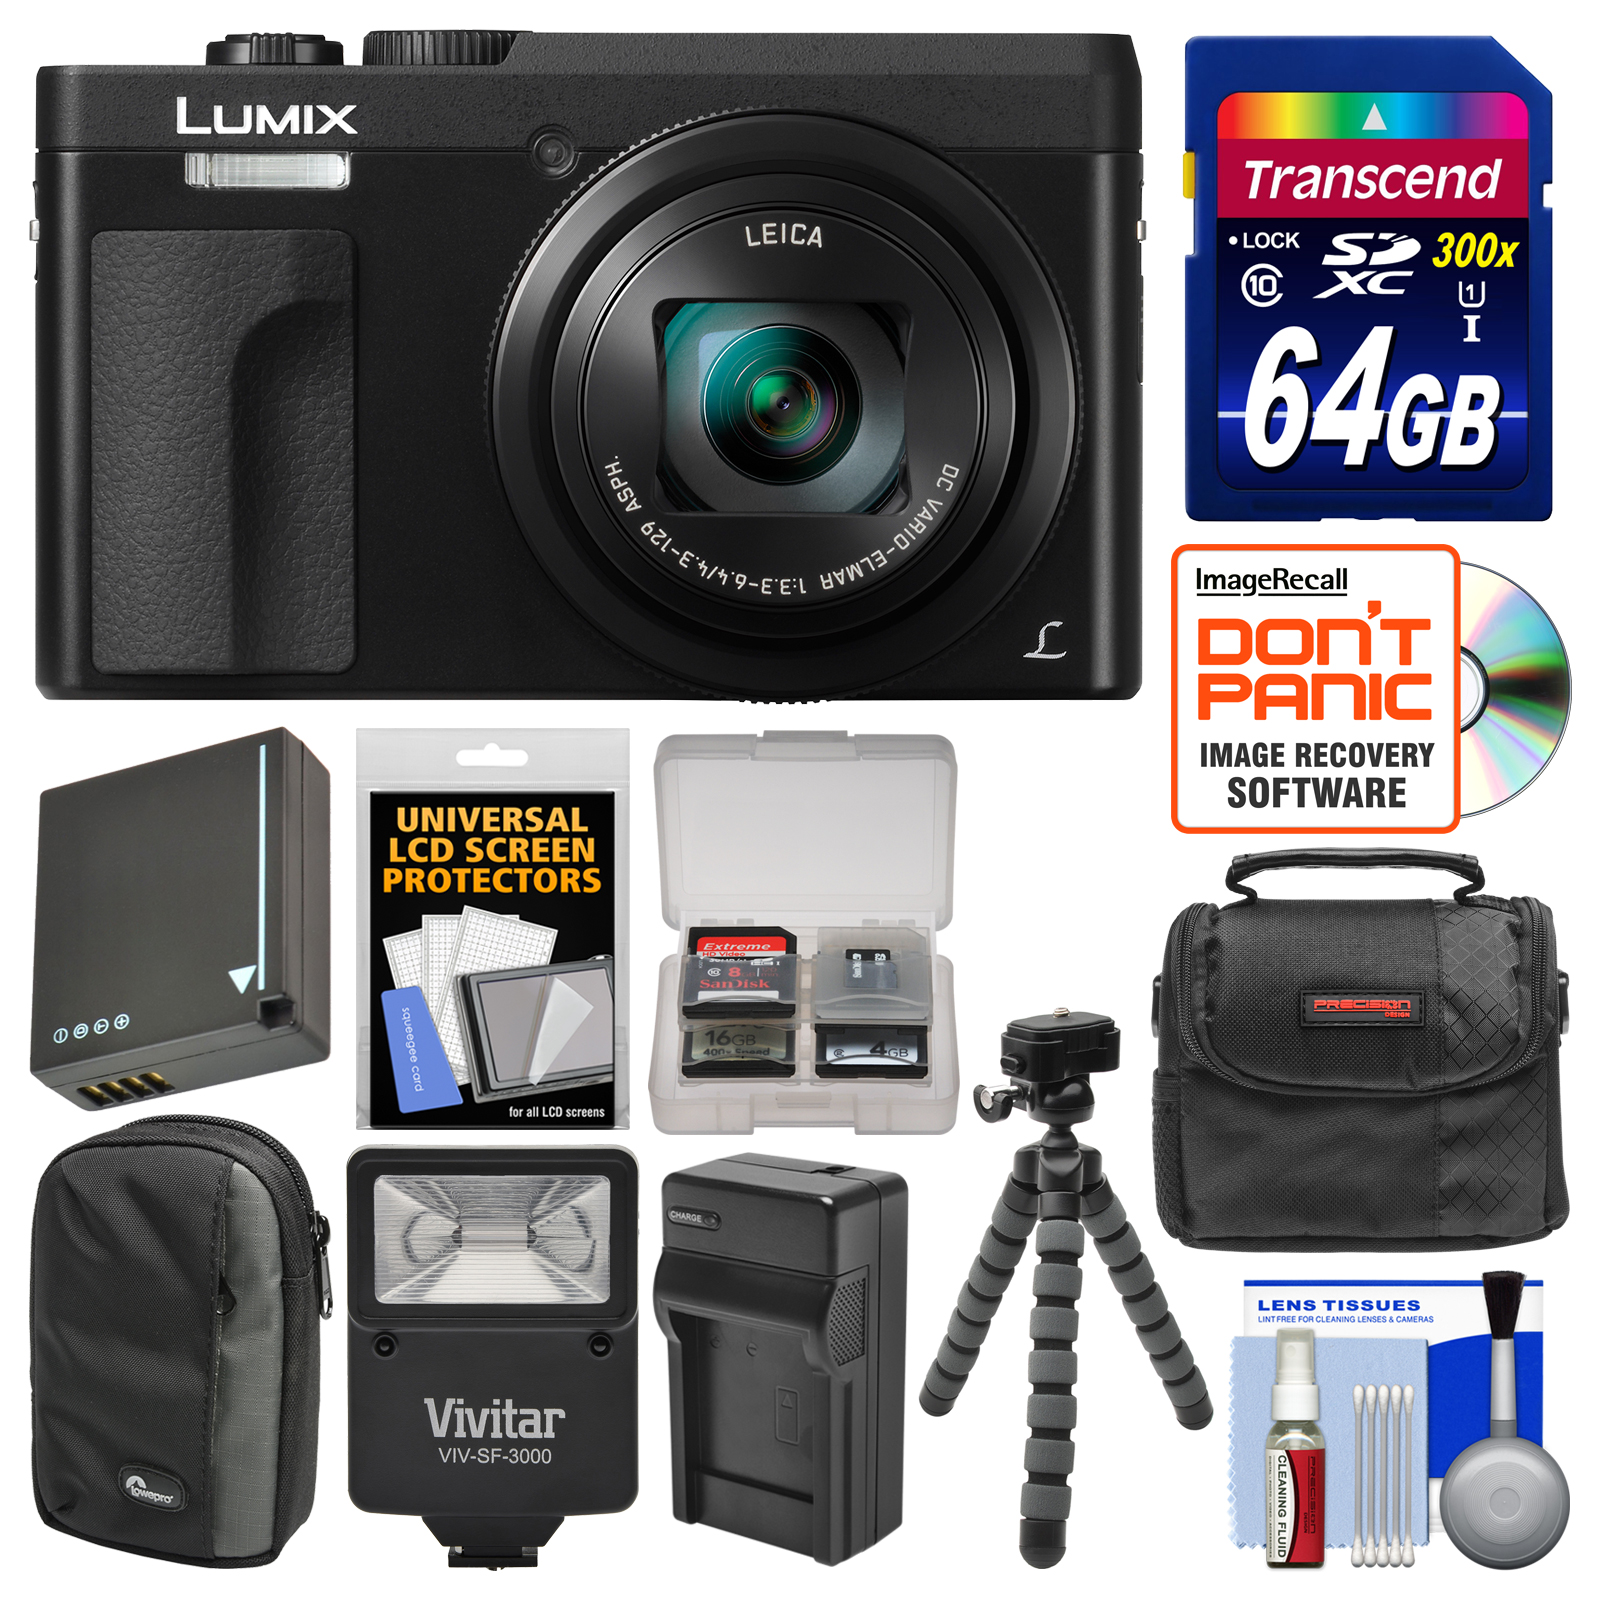 Panasonic Lumix DMC-FH25 Digital Camera Case Replacement by Vidpro